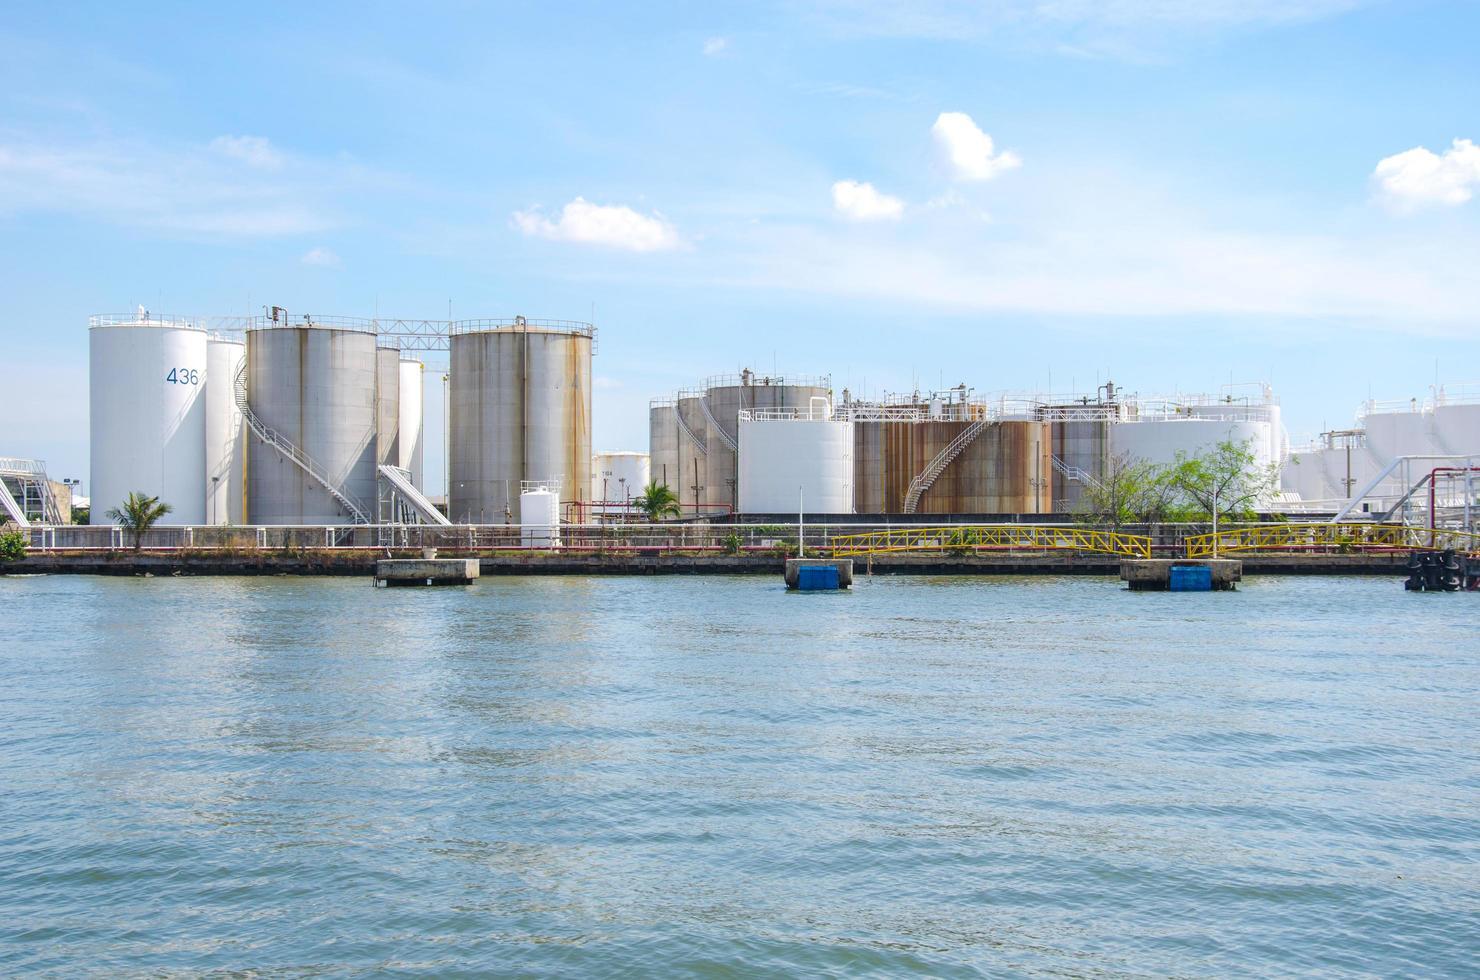 tanques de armazenamento de óleo foto